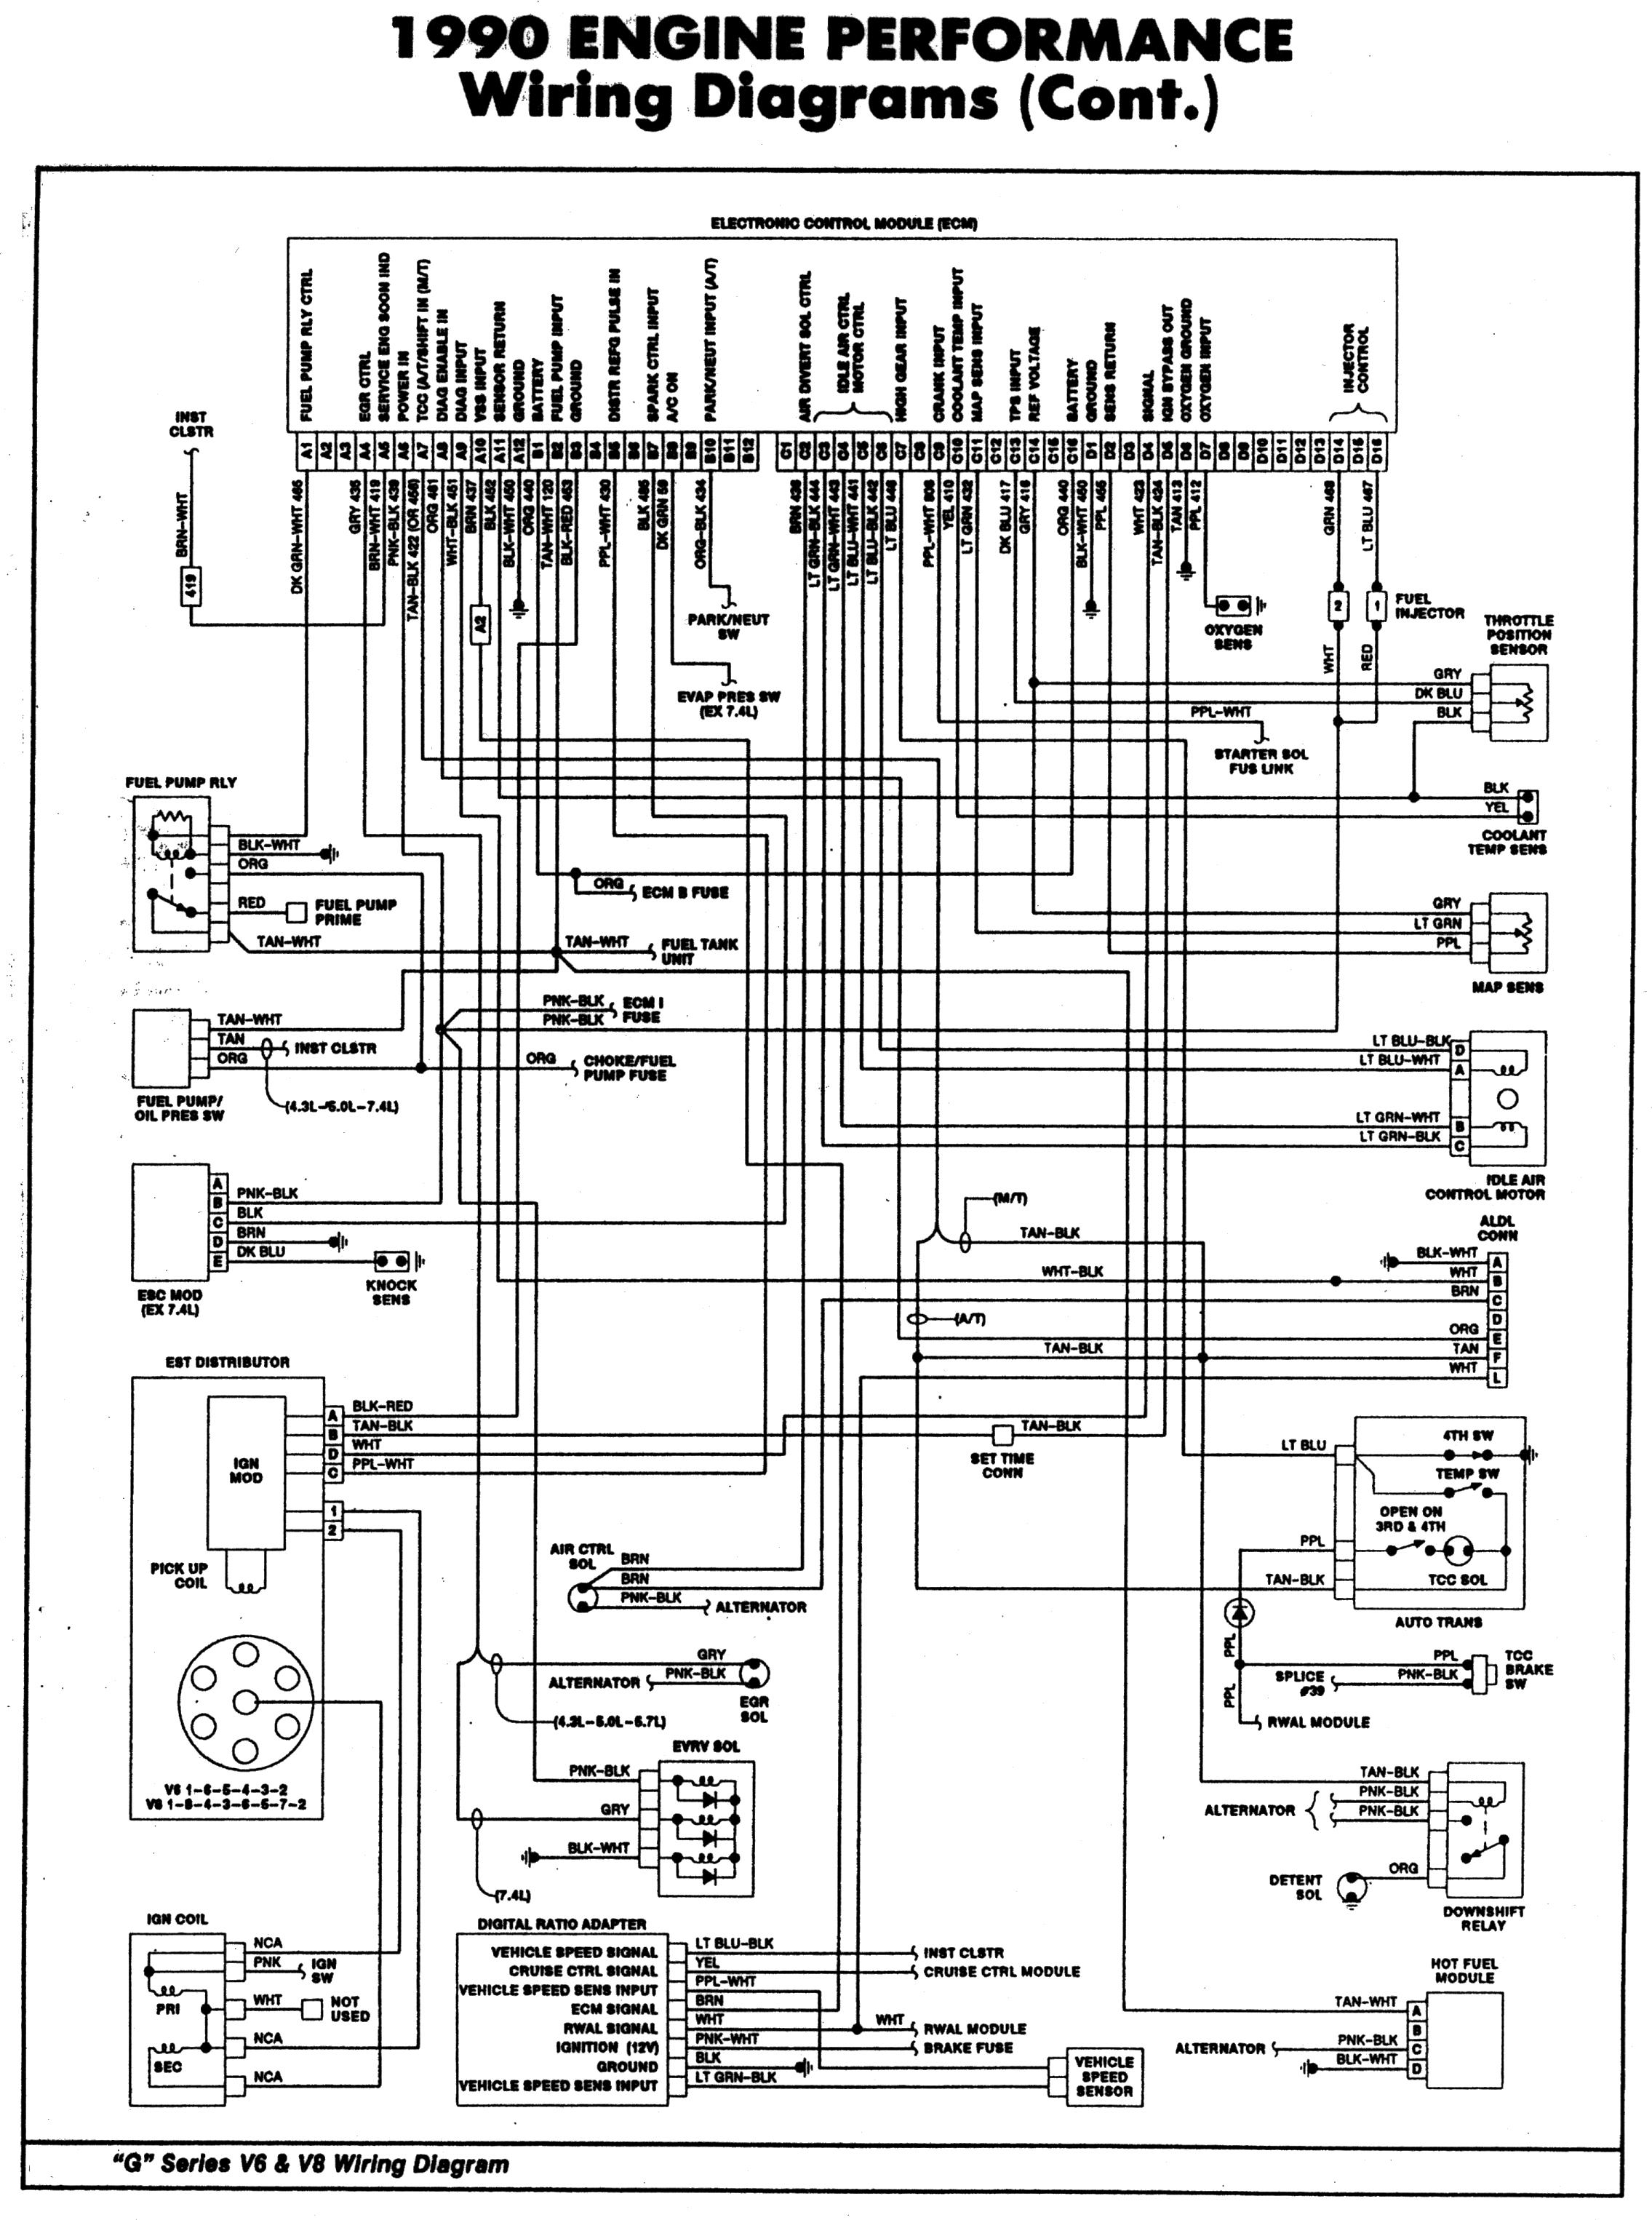 350 tbi wiring diagram fuel wiring diagram write 92 tbi wiring diagram wiring diagrams schema 89 camaro wiring diagram 350 tbi vacuum port diagram